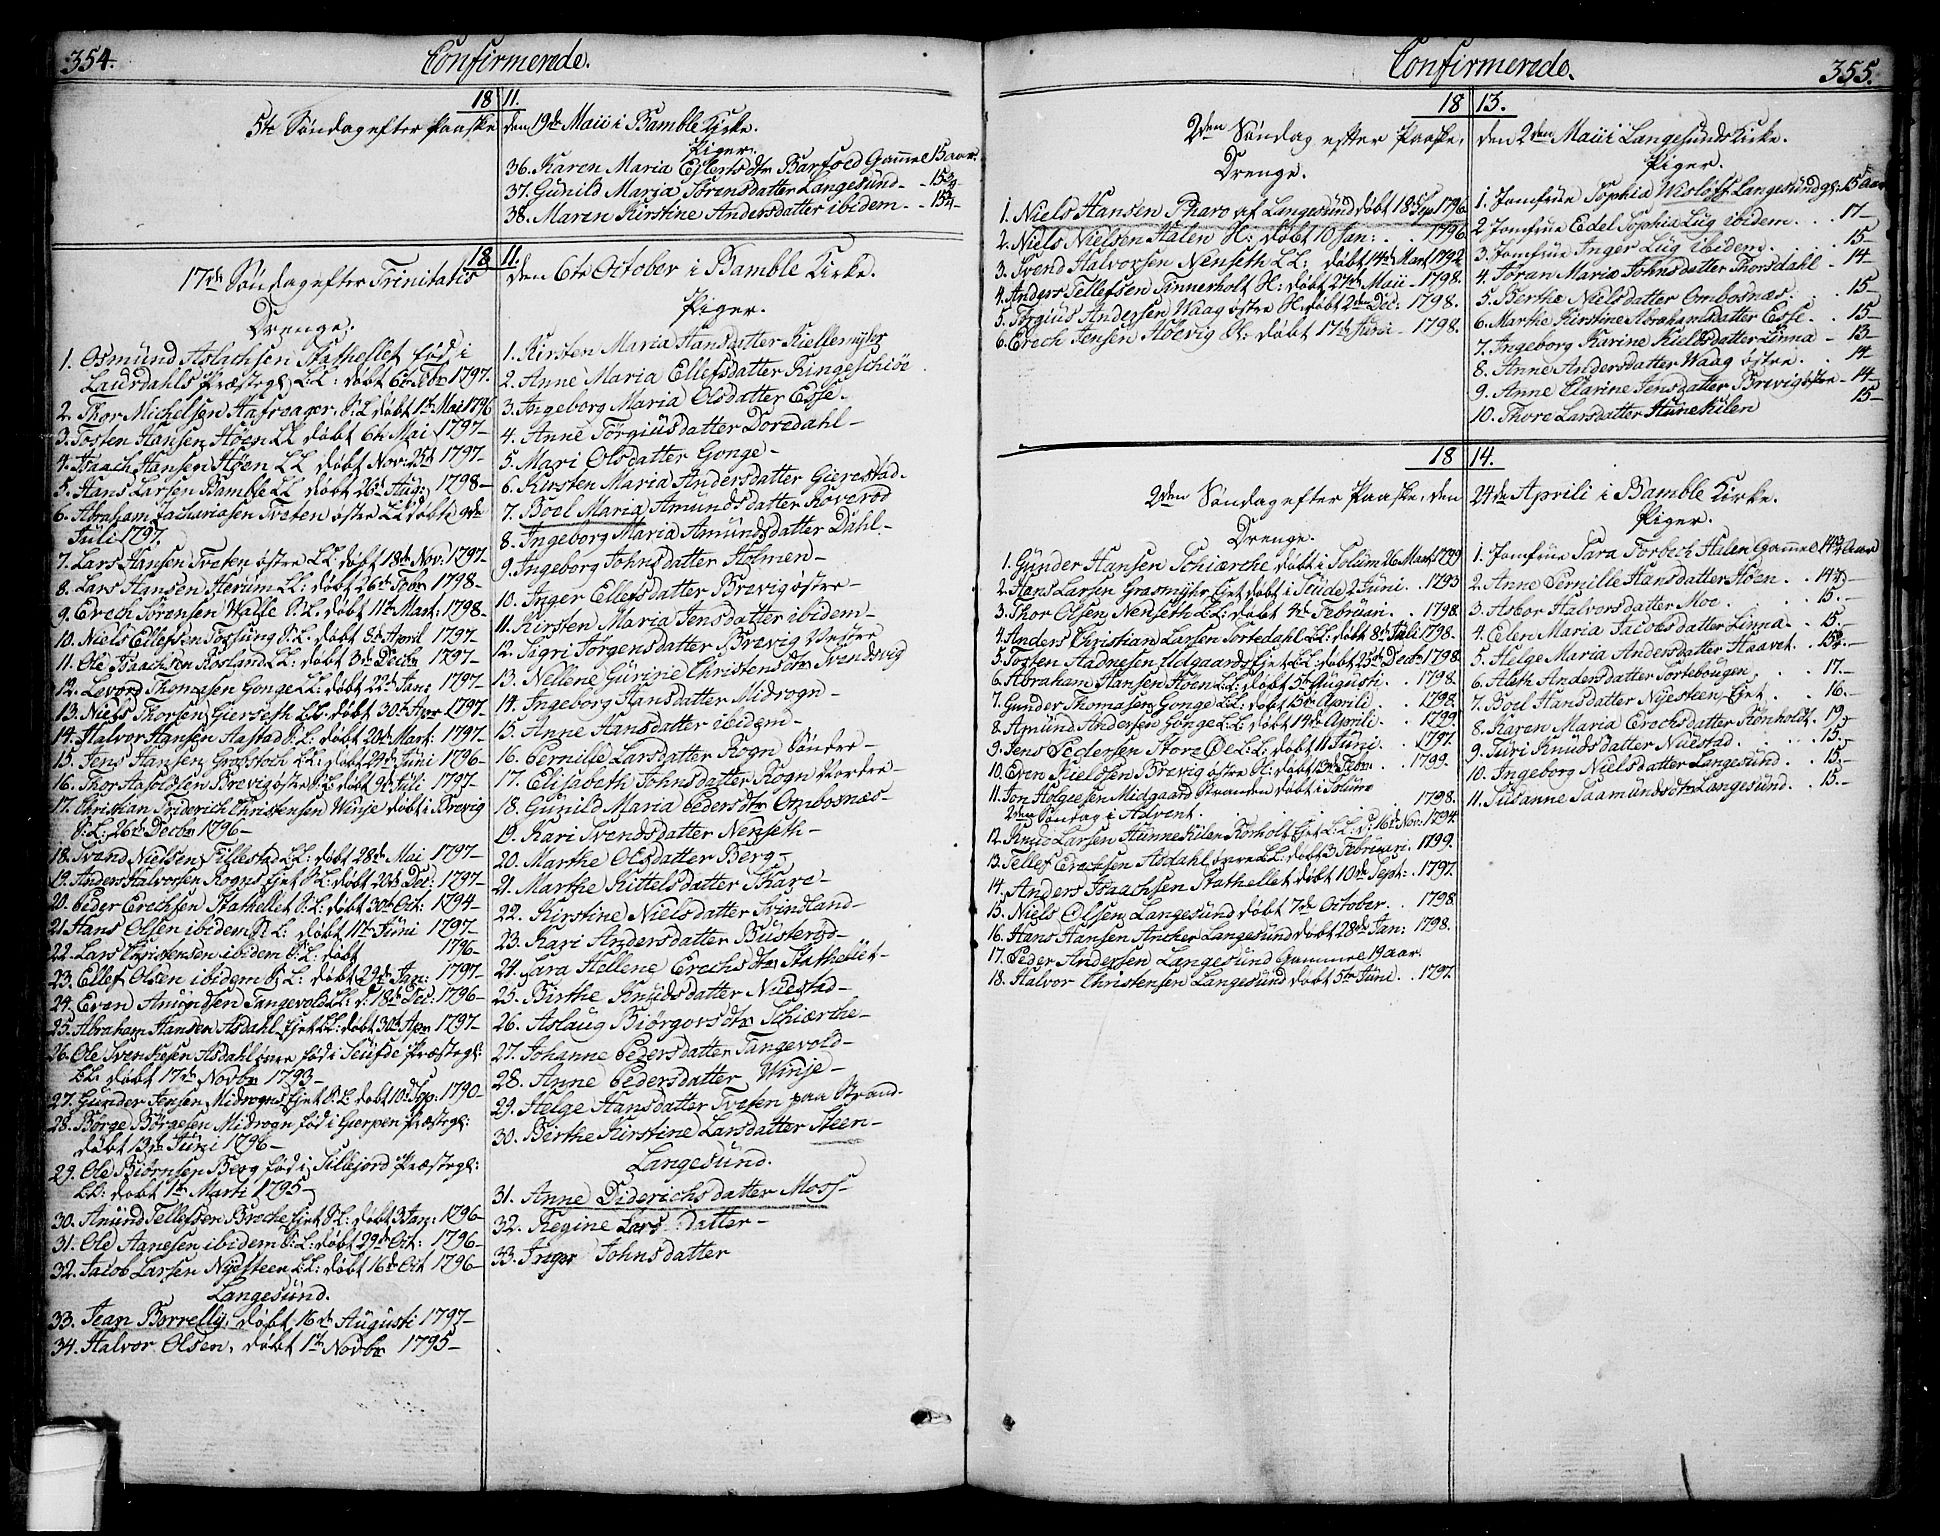 SAKO, Bamble kirkebøker, F/Fa/L0002: Ministerialbok nr. I 2, 1775-1814, s. 354-355